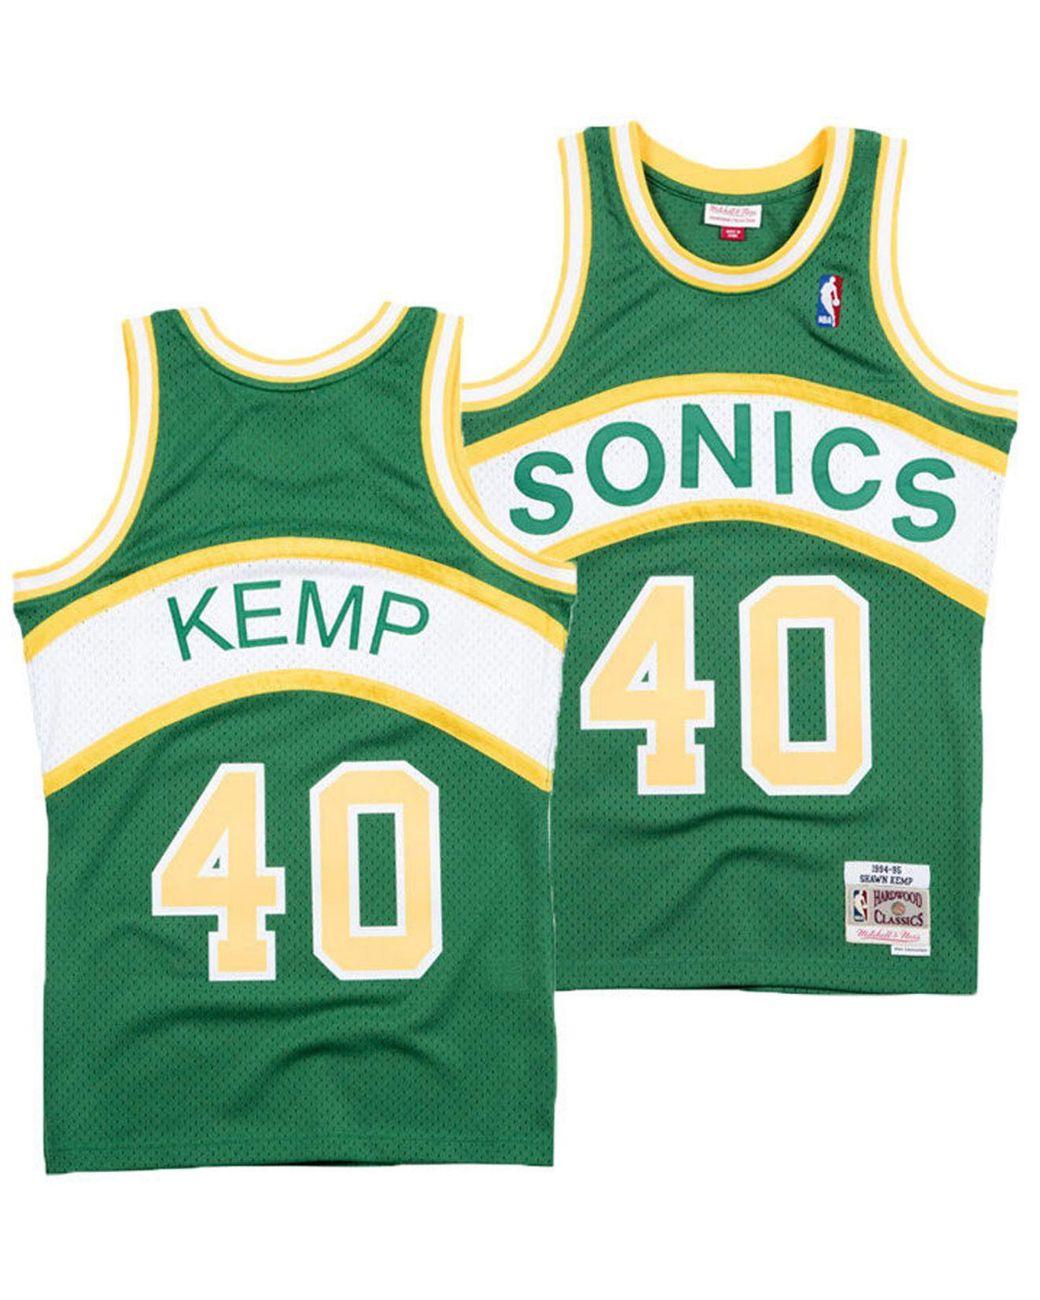 sale retailer 7a8de b8431 Men's Green Shawn Kemp Seattle Supersonics Hardwood Classic Swingman Jersey